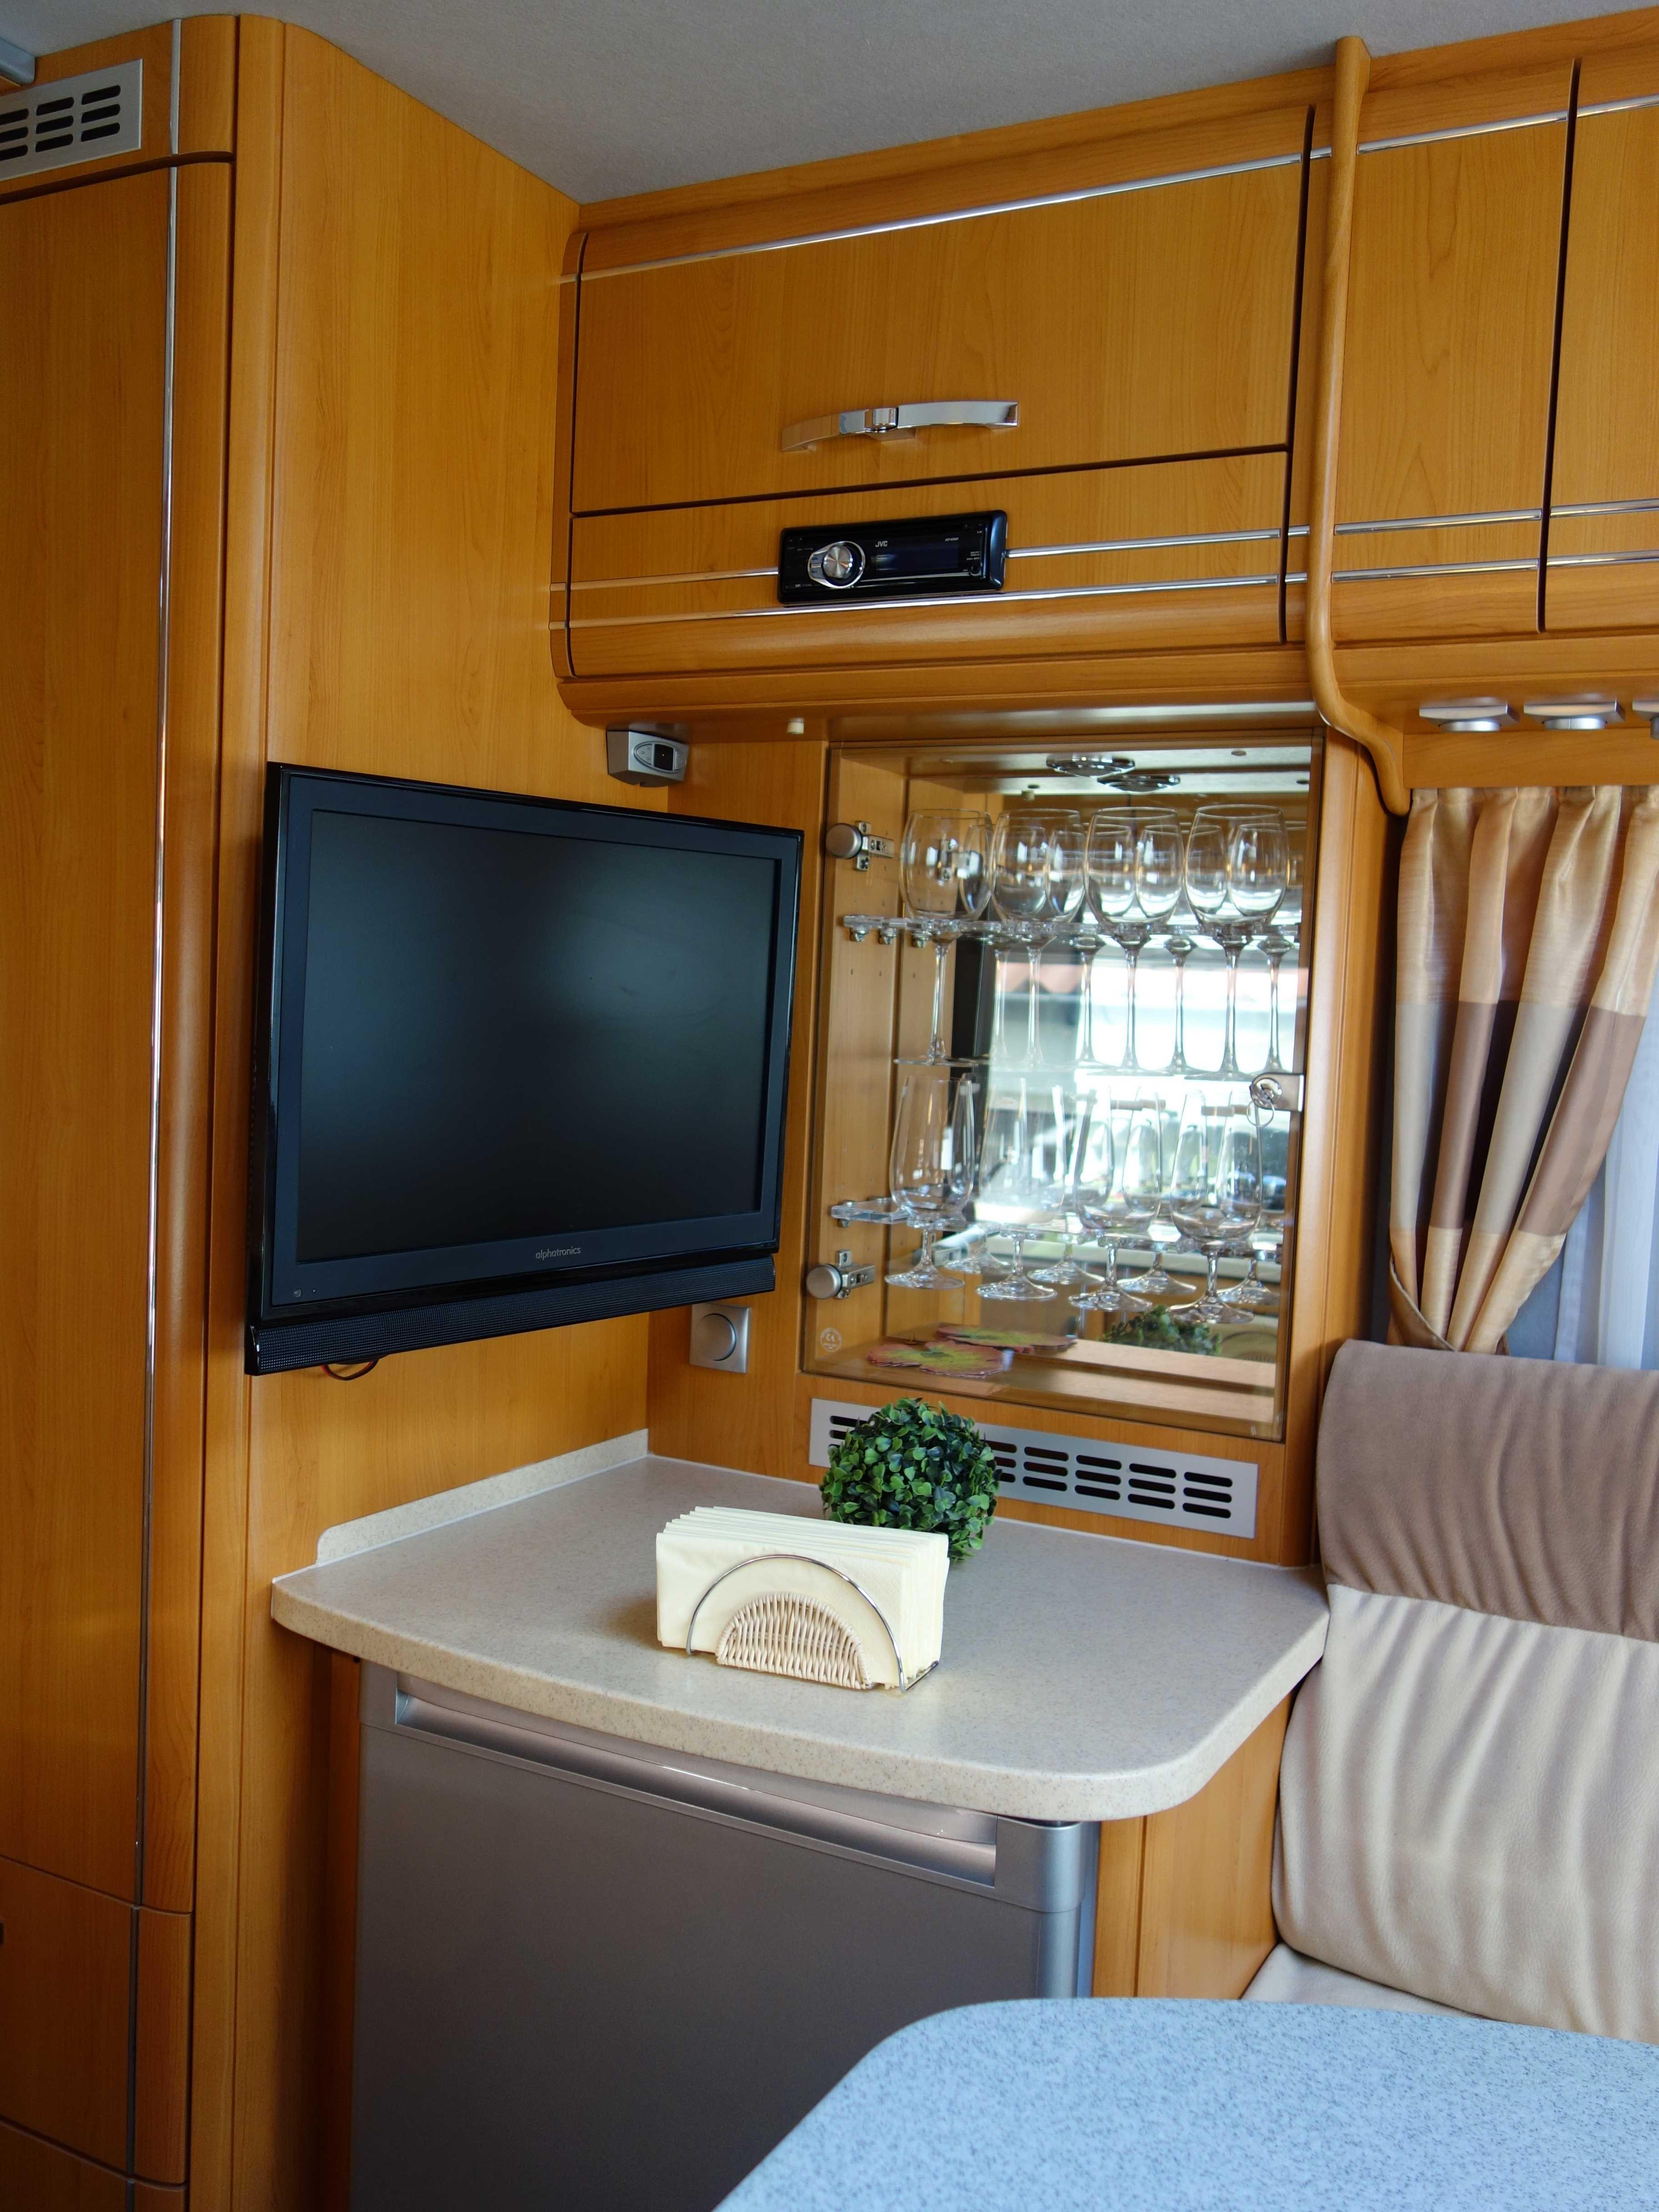 PhoeniX 8000 Flat TV